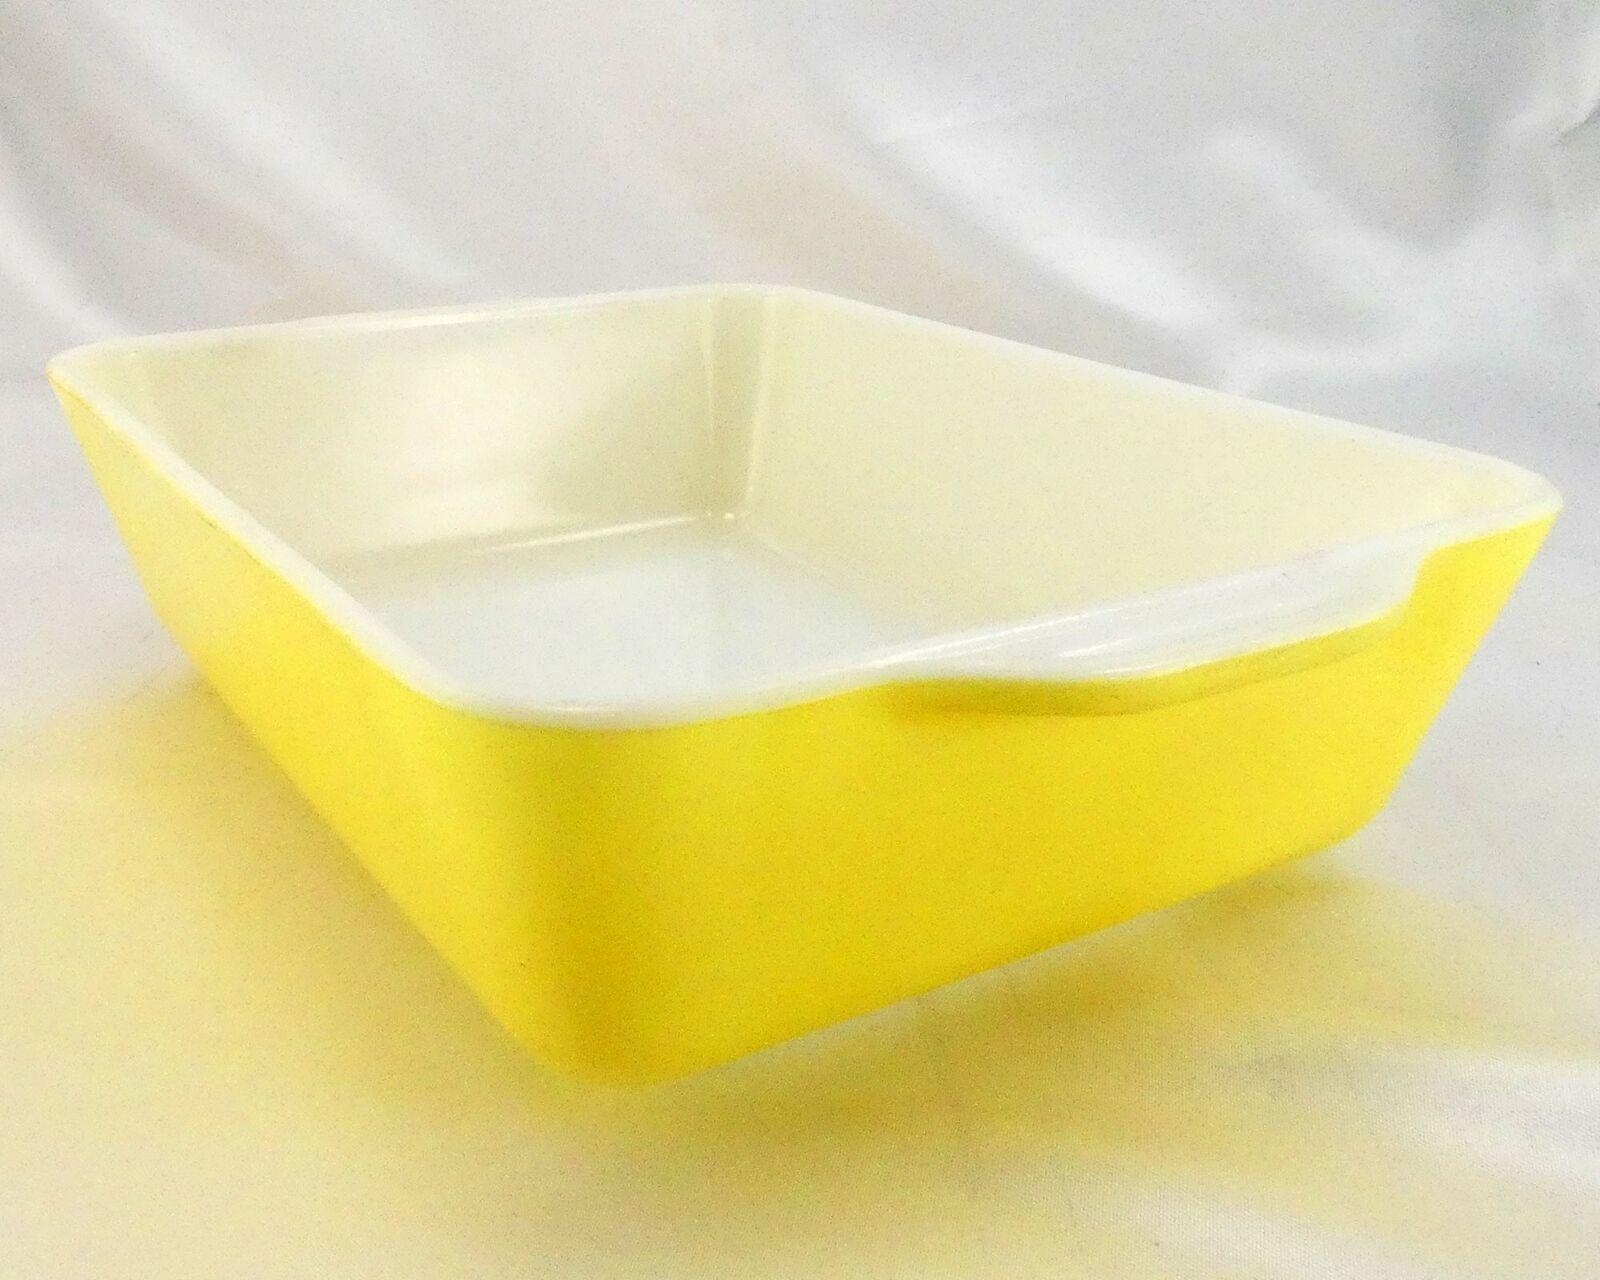 Pyrex 503 Banana Yellow Fridge Dish Milk Glass w/ Lid Made in the USA image 5